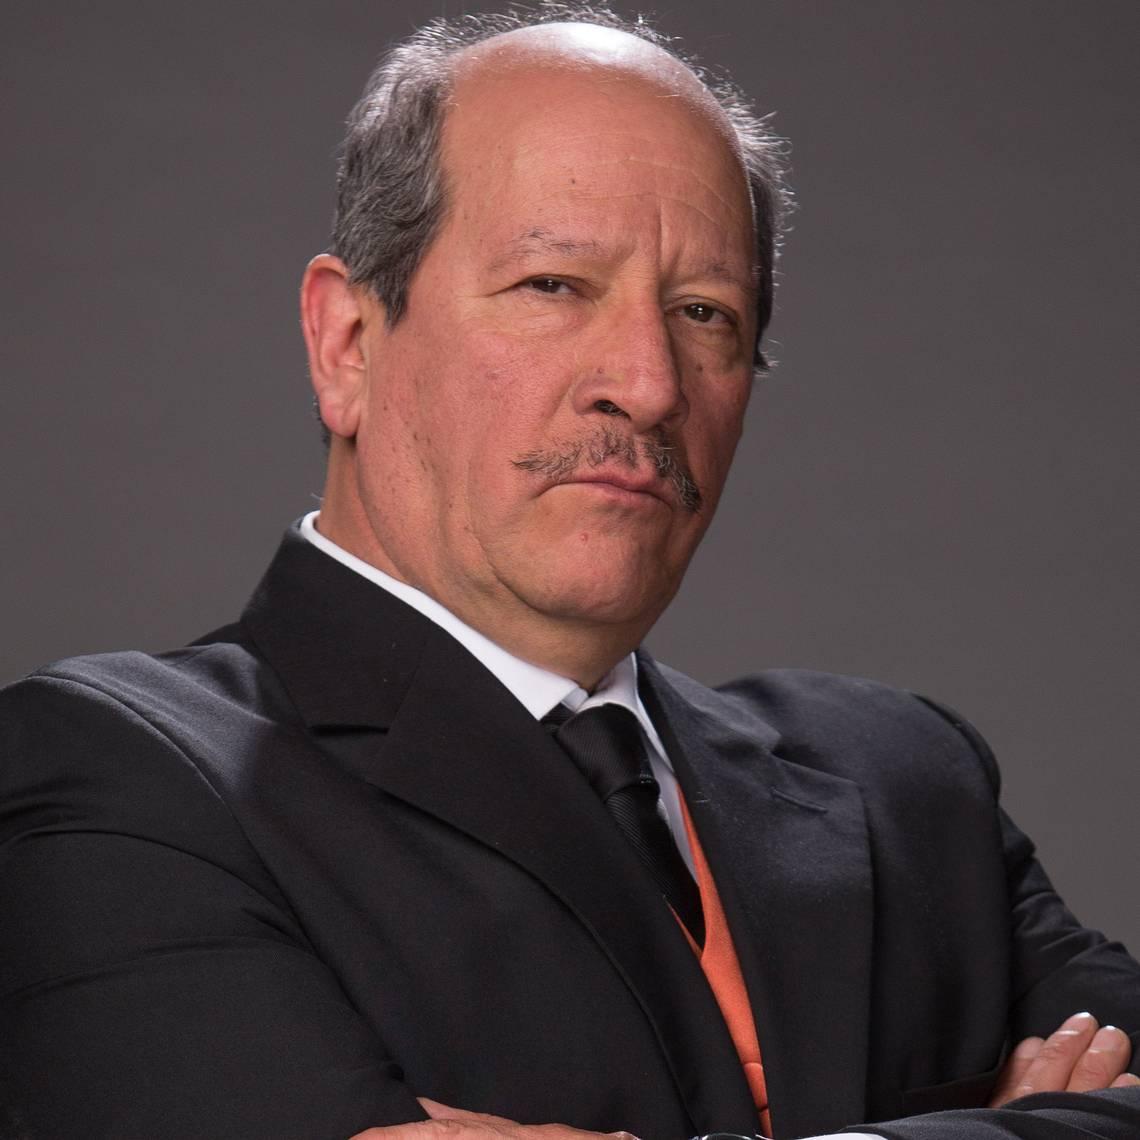 Roberto Muñoz Contreras